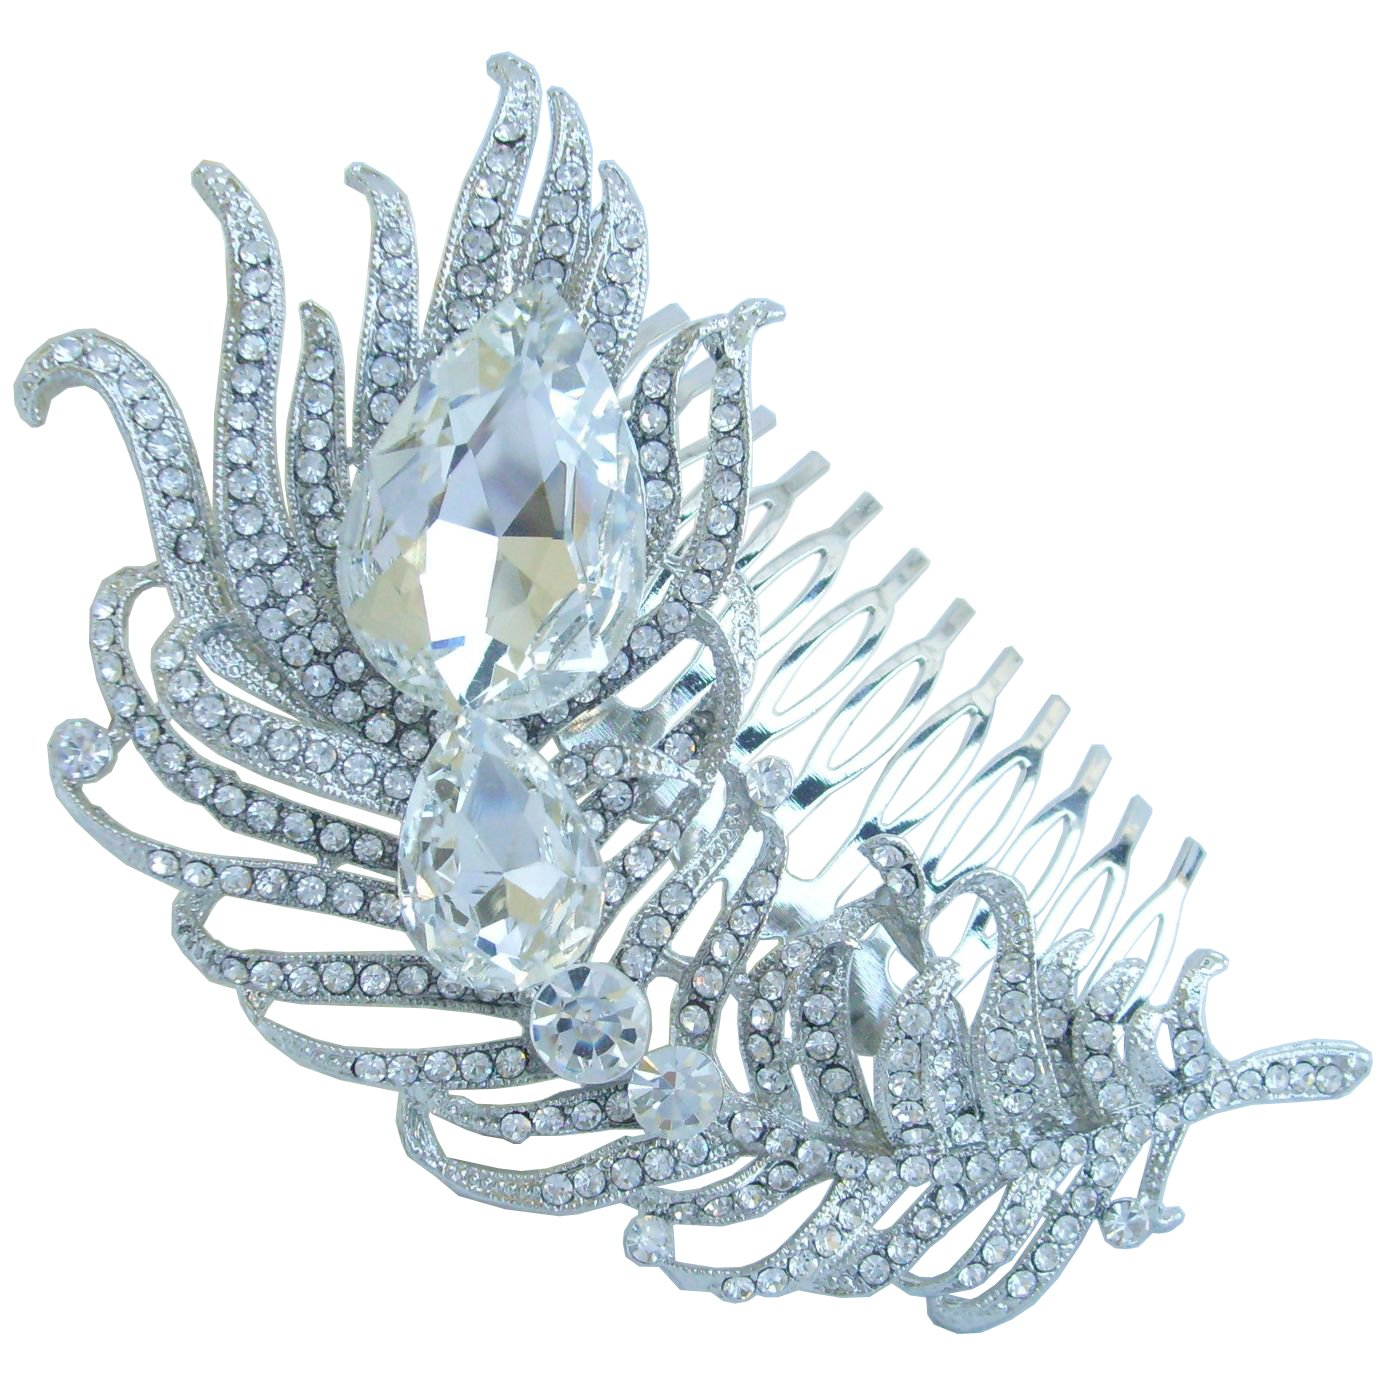 Sindary Wedding Headpiece 4.33'' Rhinestone Crystal Bridal Peacock Feather Hair Comb (Silver-Tone Clear)